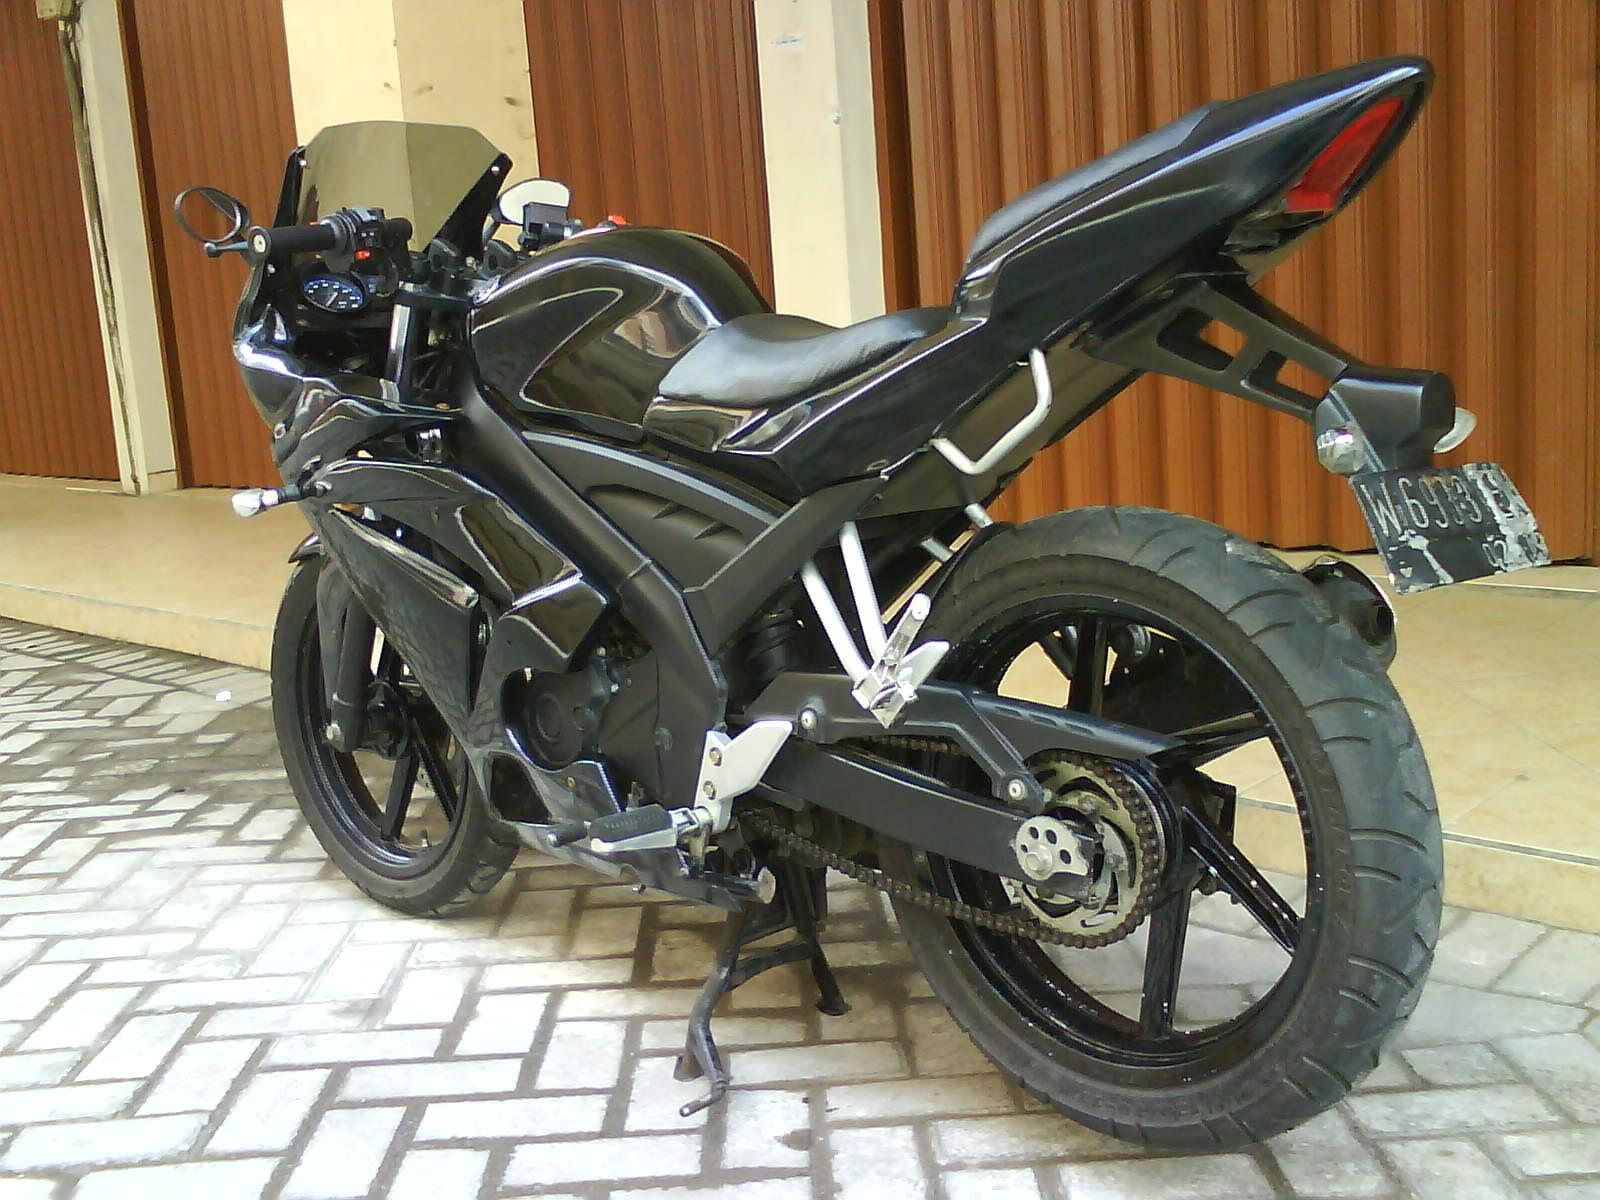 Modifikasi Knalpot Yamaha F1zr